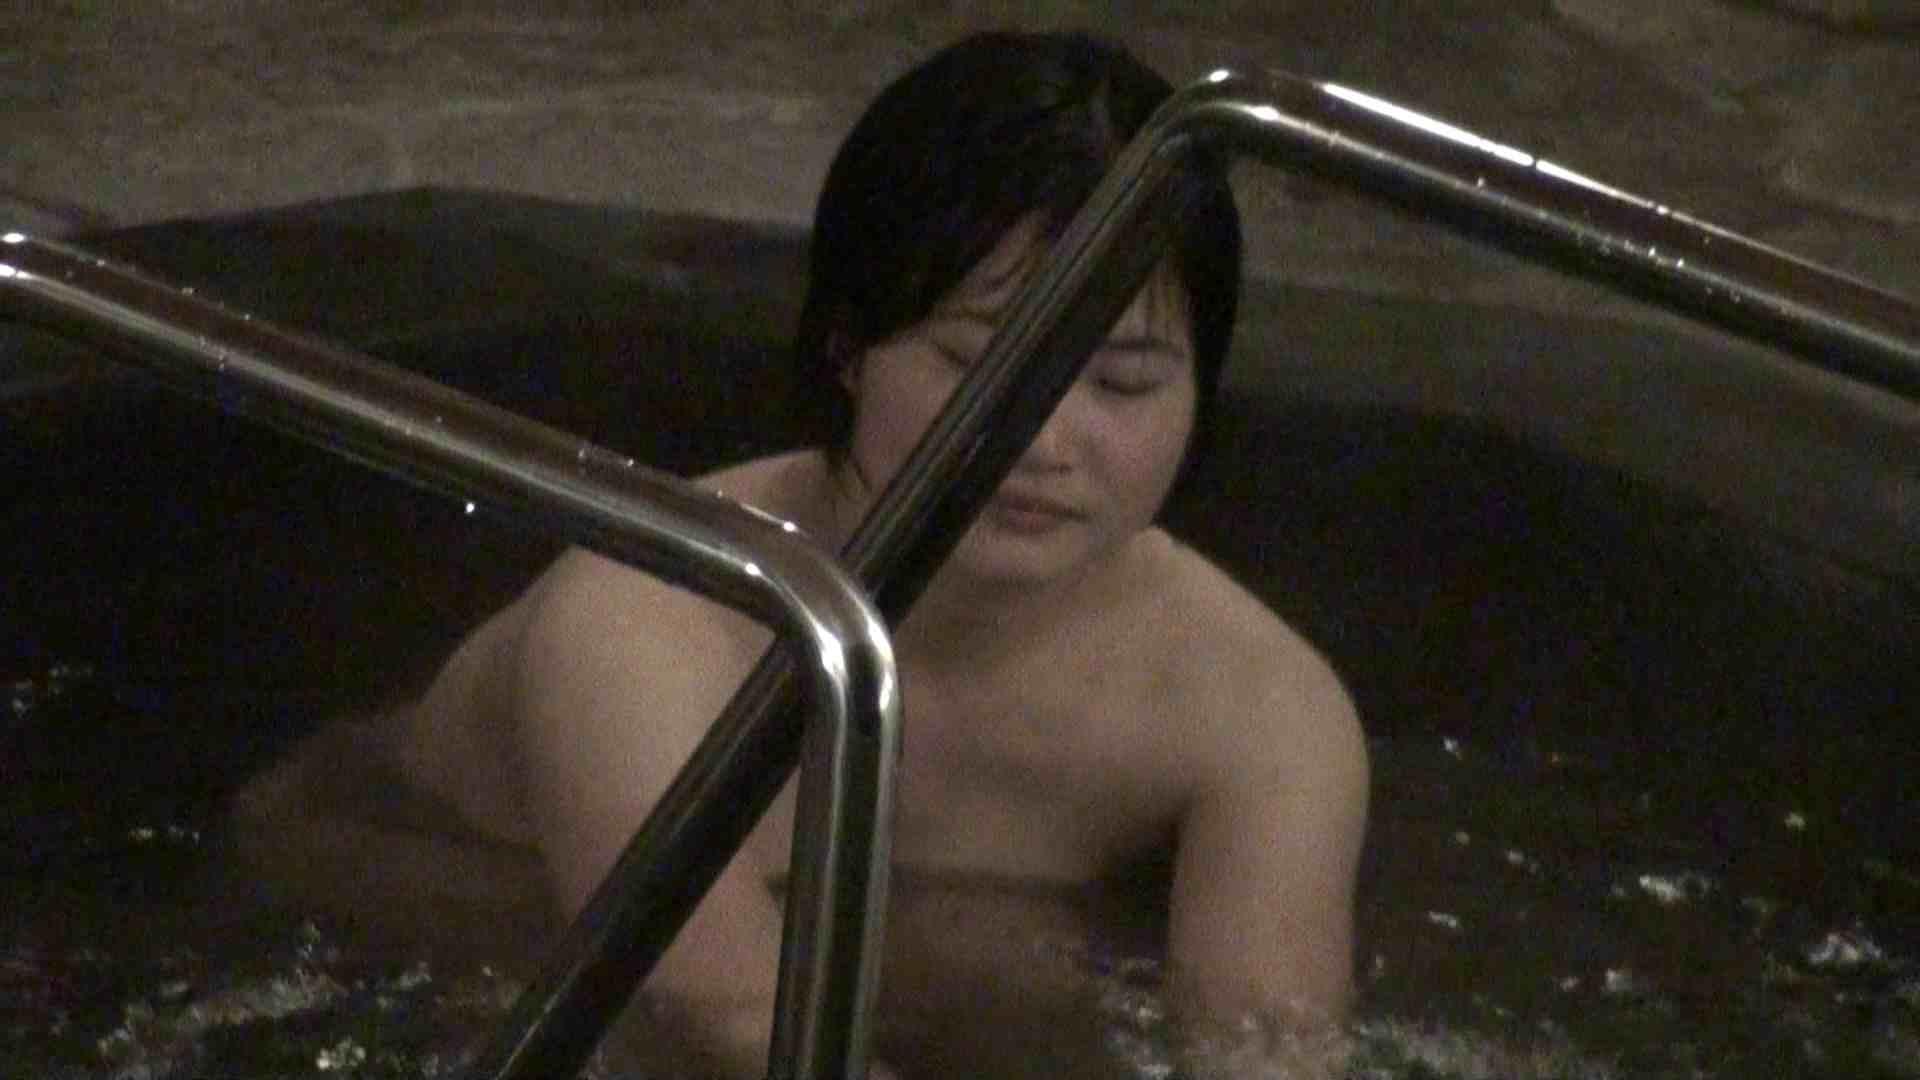 Aquaな露天風呂Vol.384 盗撮シリーズ | 露天風呂編  113PIX 73